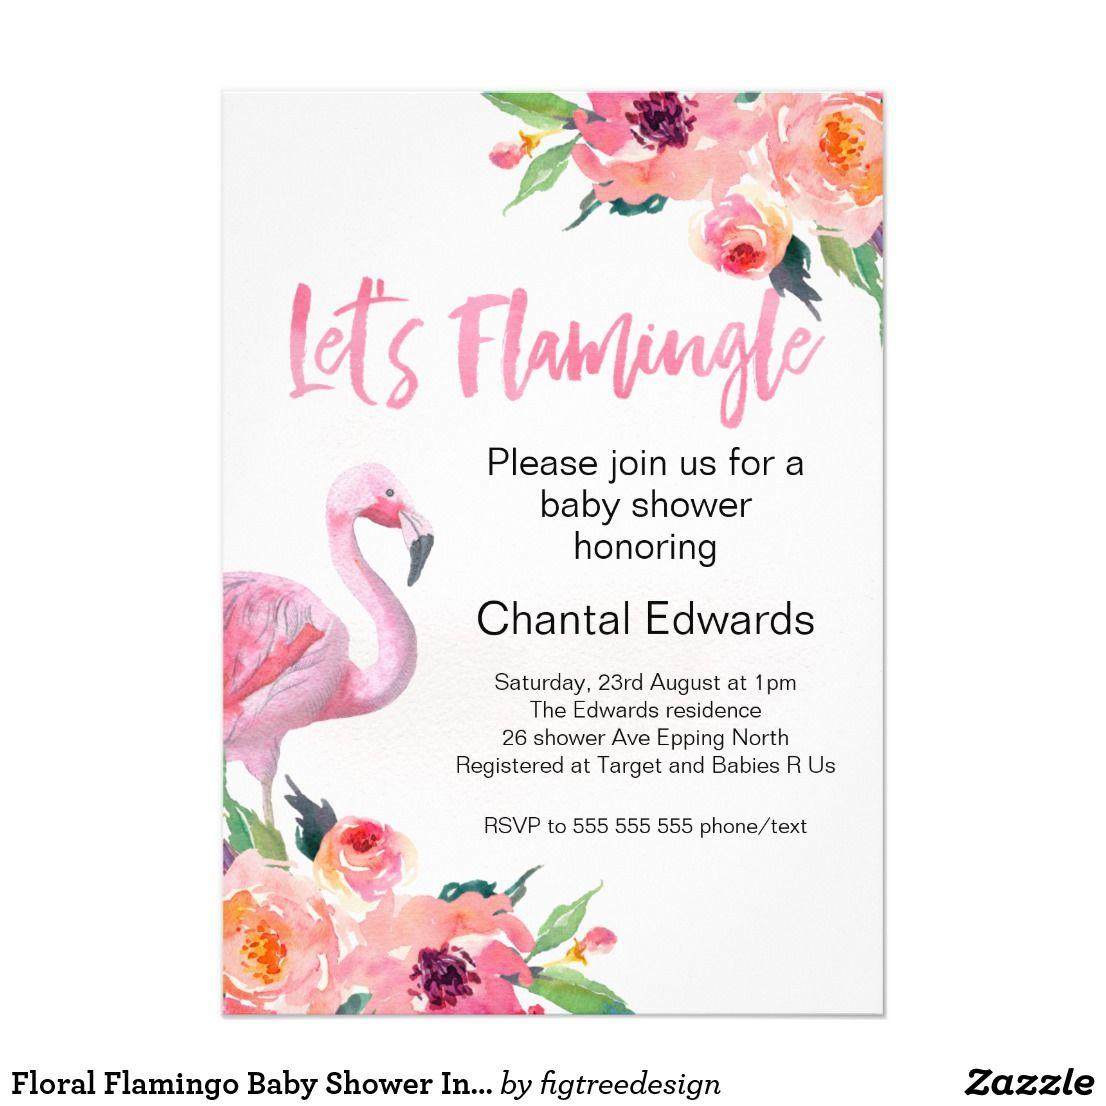 Floral Flamingo Baby Shower Invitation | Flamingo baby shower, Baby shower  invitations, Invitations